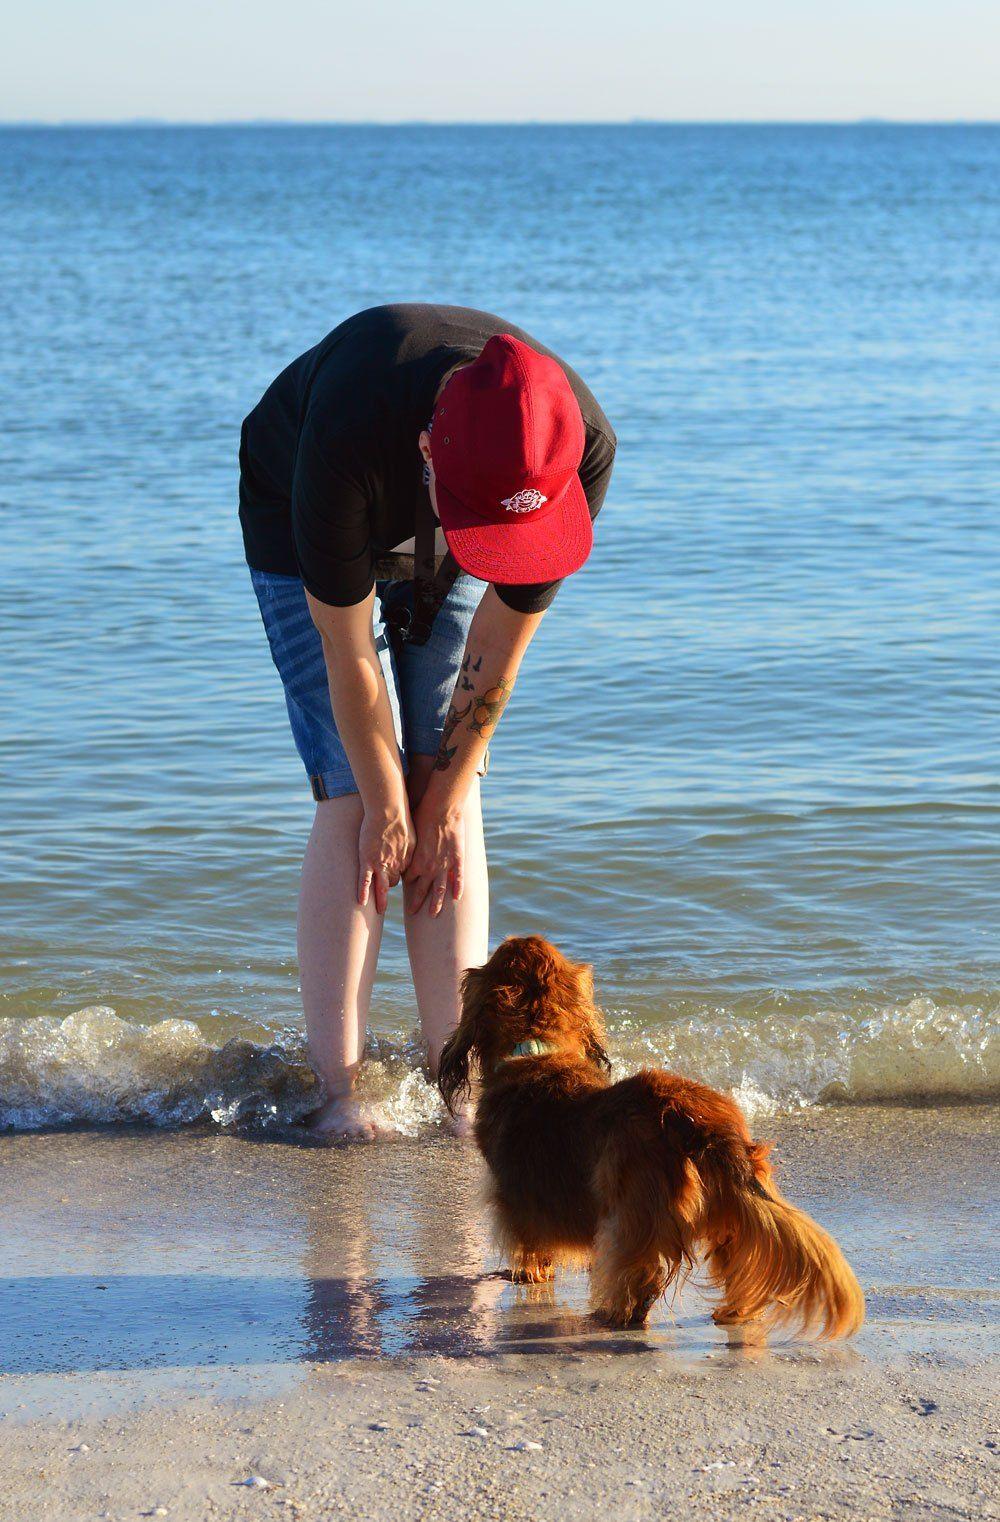 Where To Swim Play And Stay With Your Dog Indialantic To Vero Beach Florida Vero Beach Florida Dog Beach Dog Friendly Beach